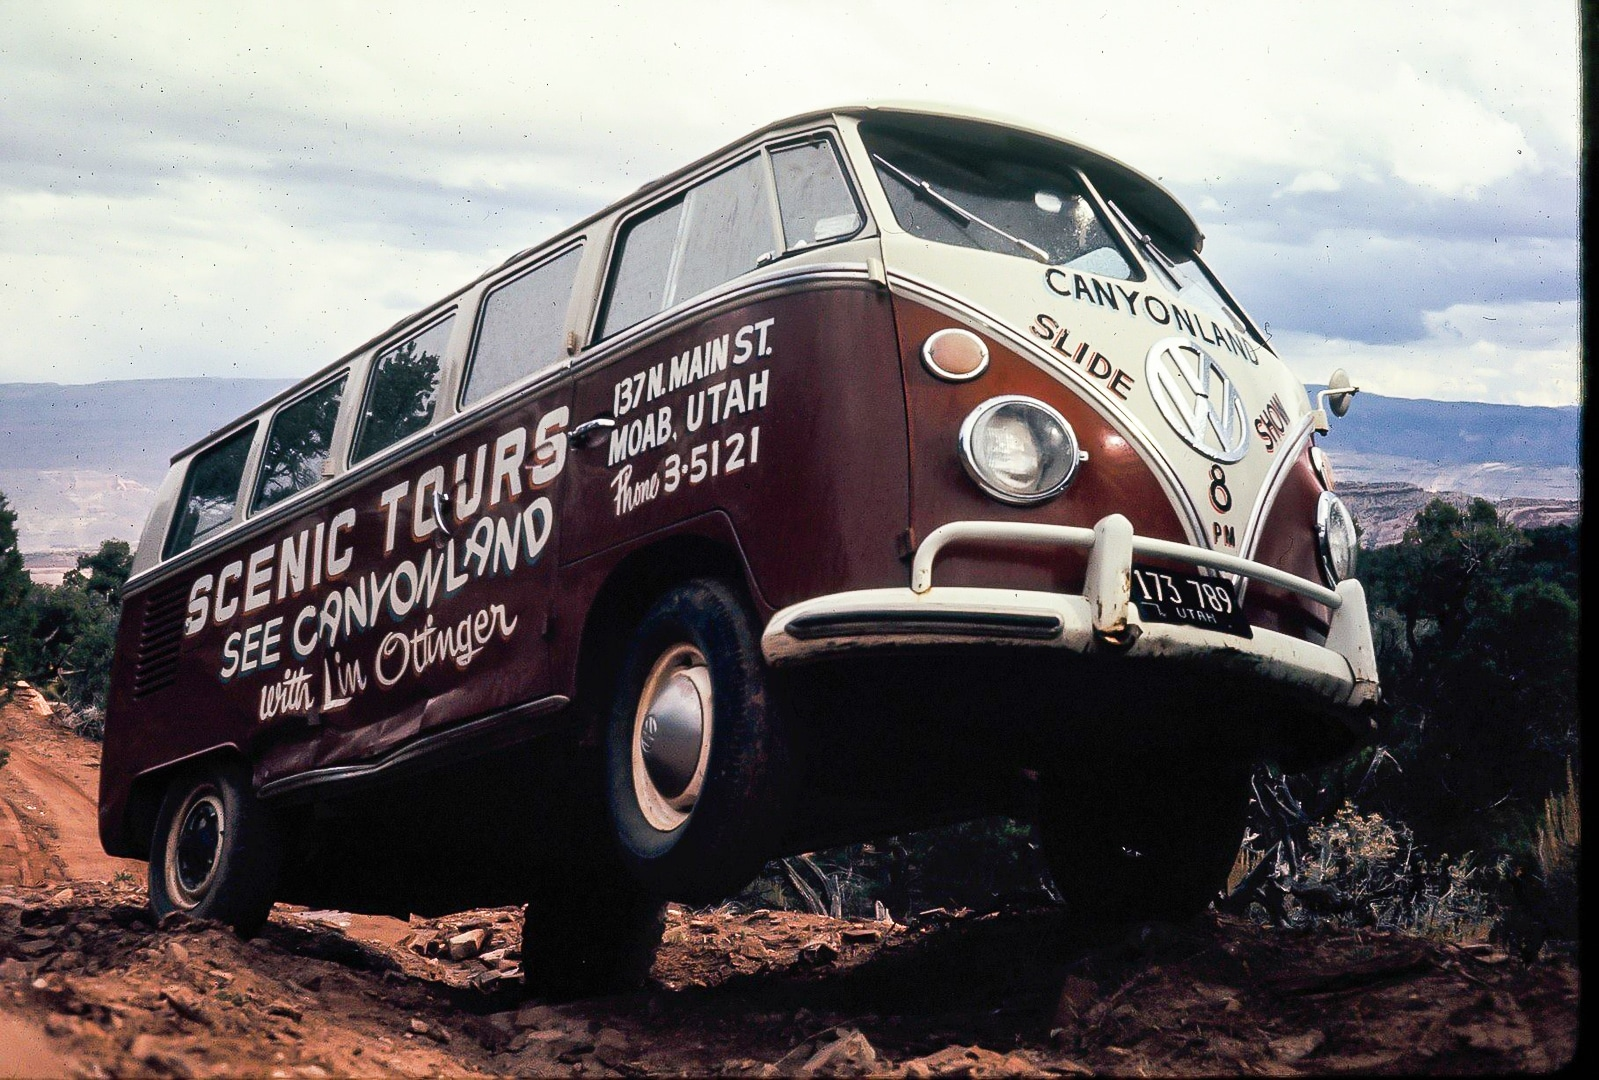 Lin Ottinger Canyon Land Scenic Tour VW Bus - BeCombi - Une-15